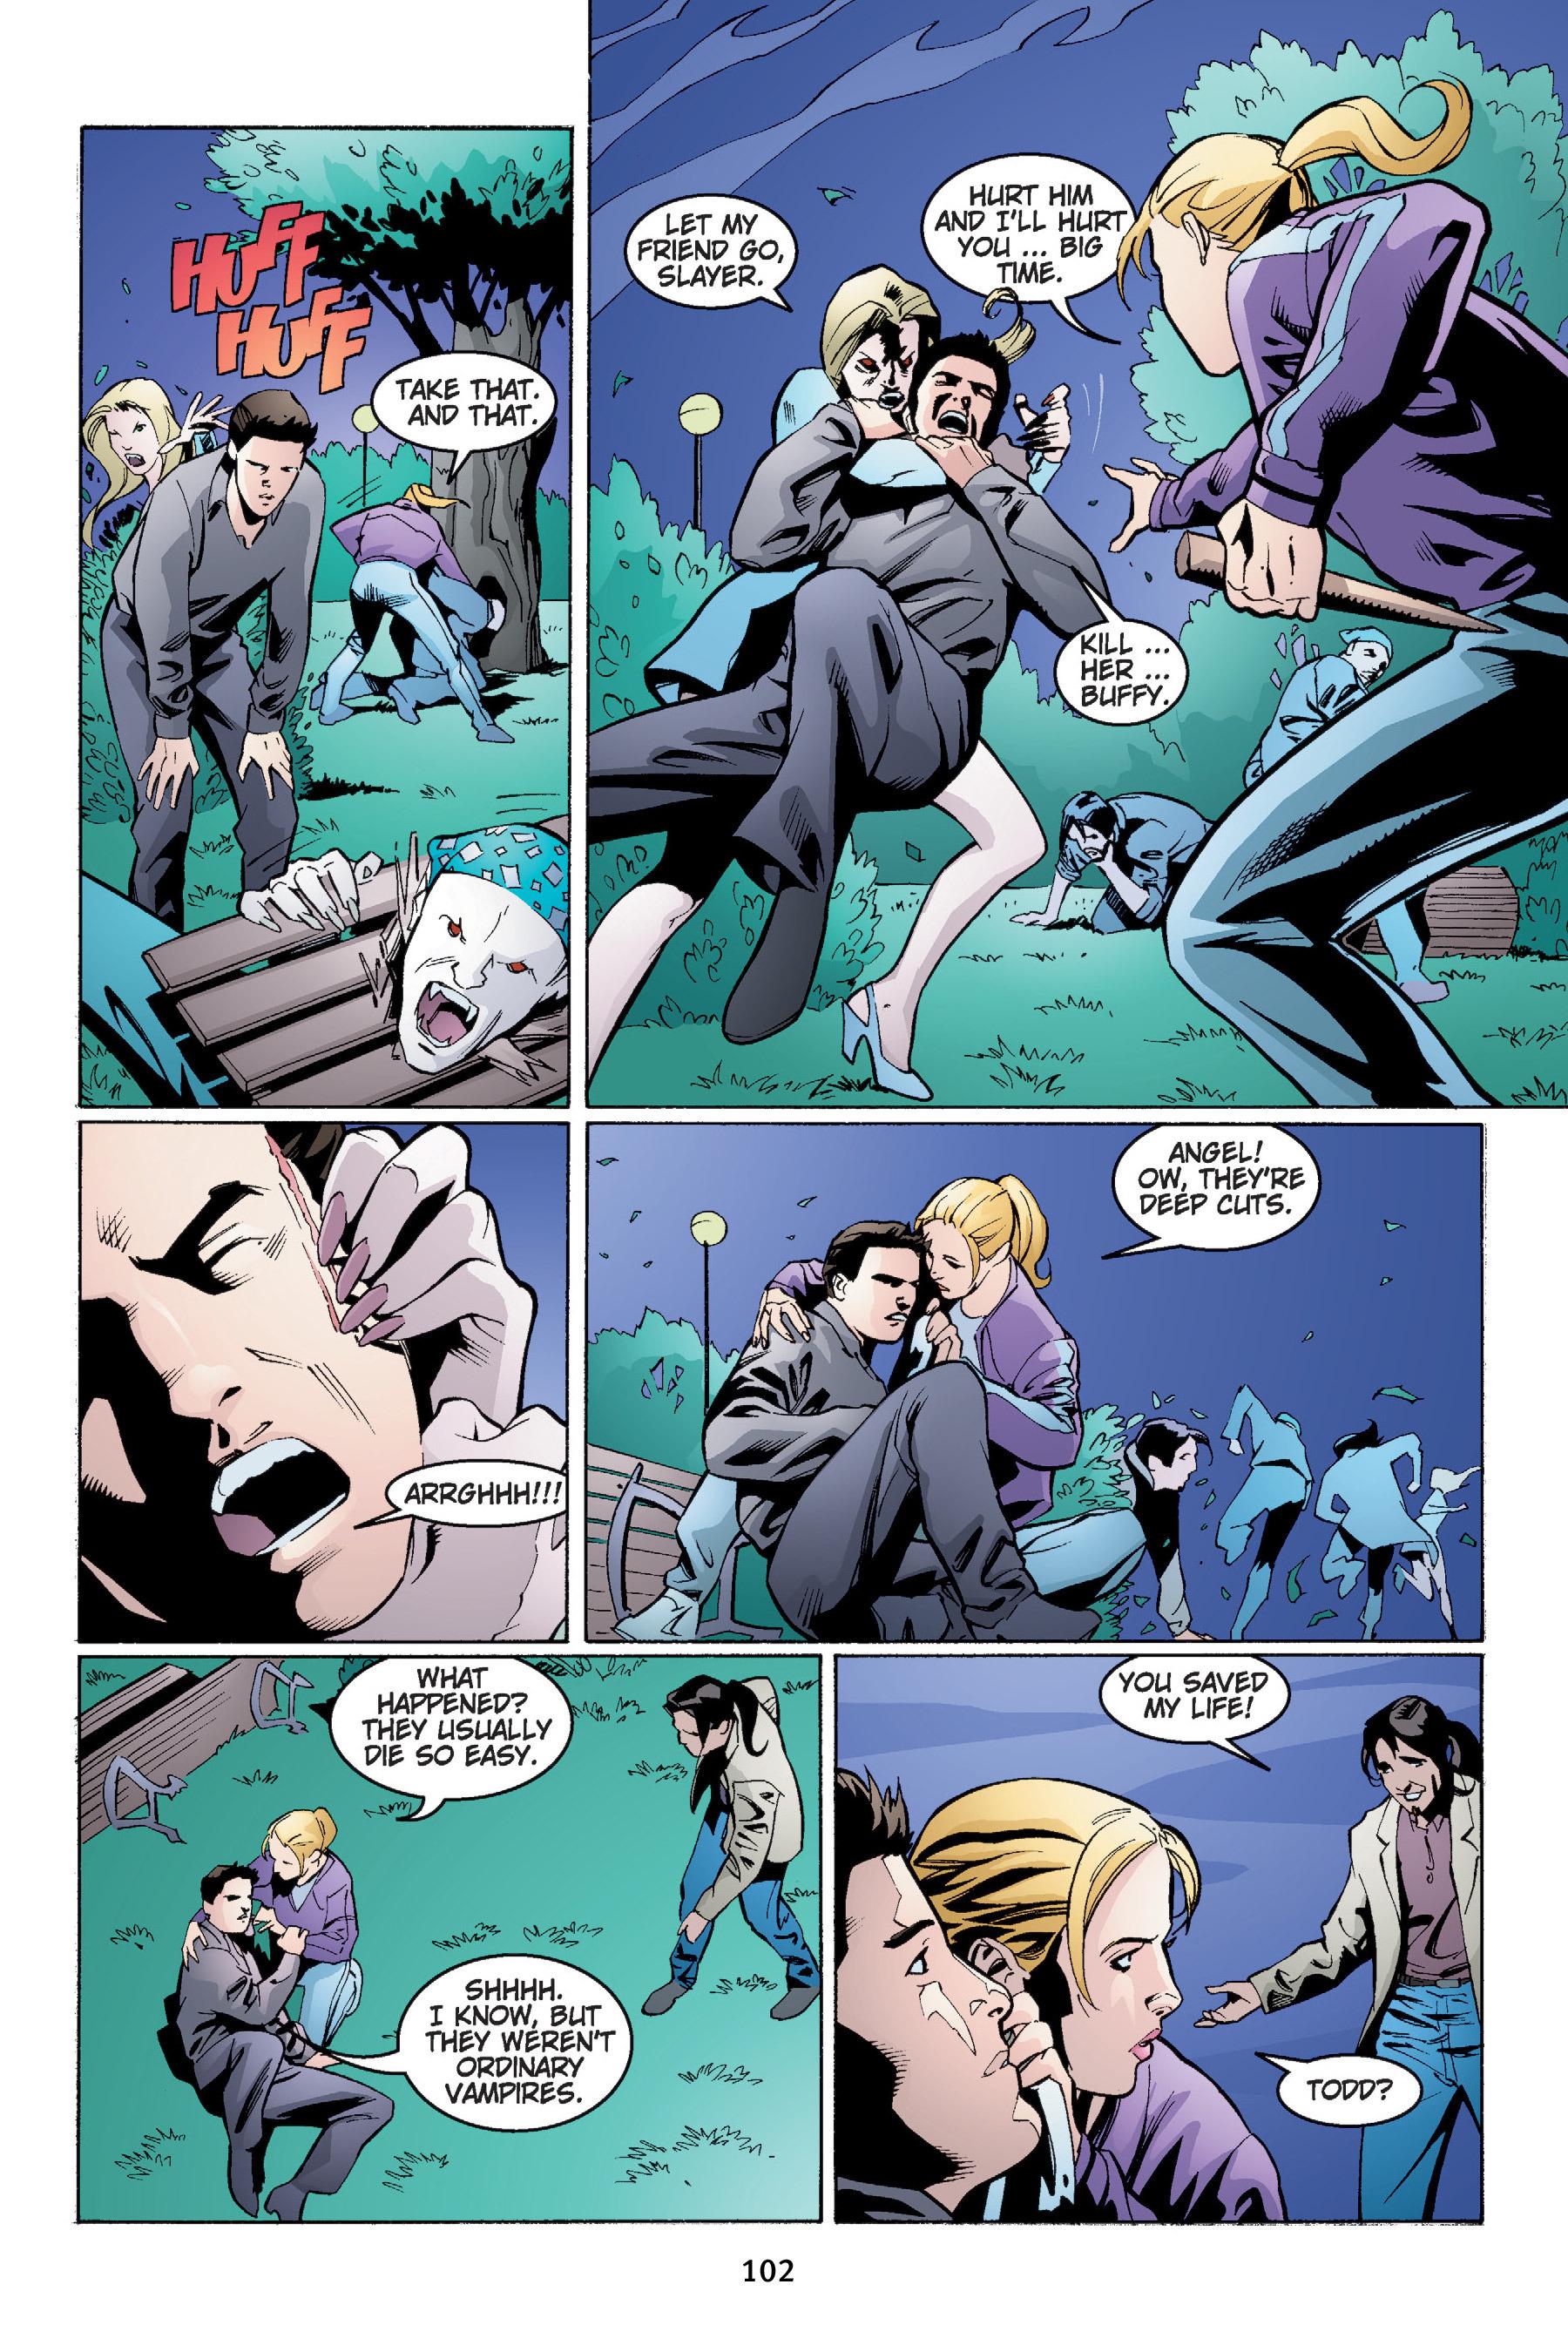 Read online Buffy the Vampire Slayer: Omnibus comic -  Issue # TPB 4 - 103